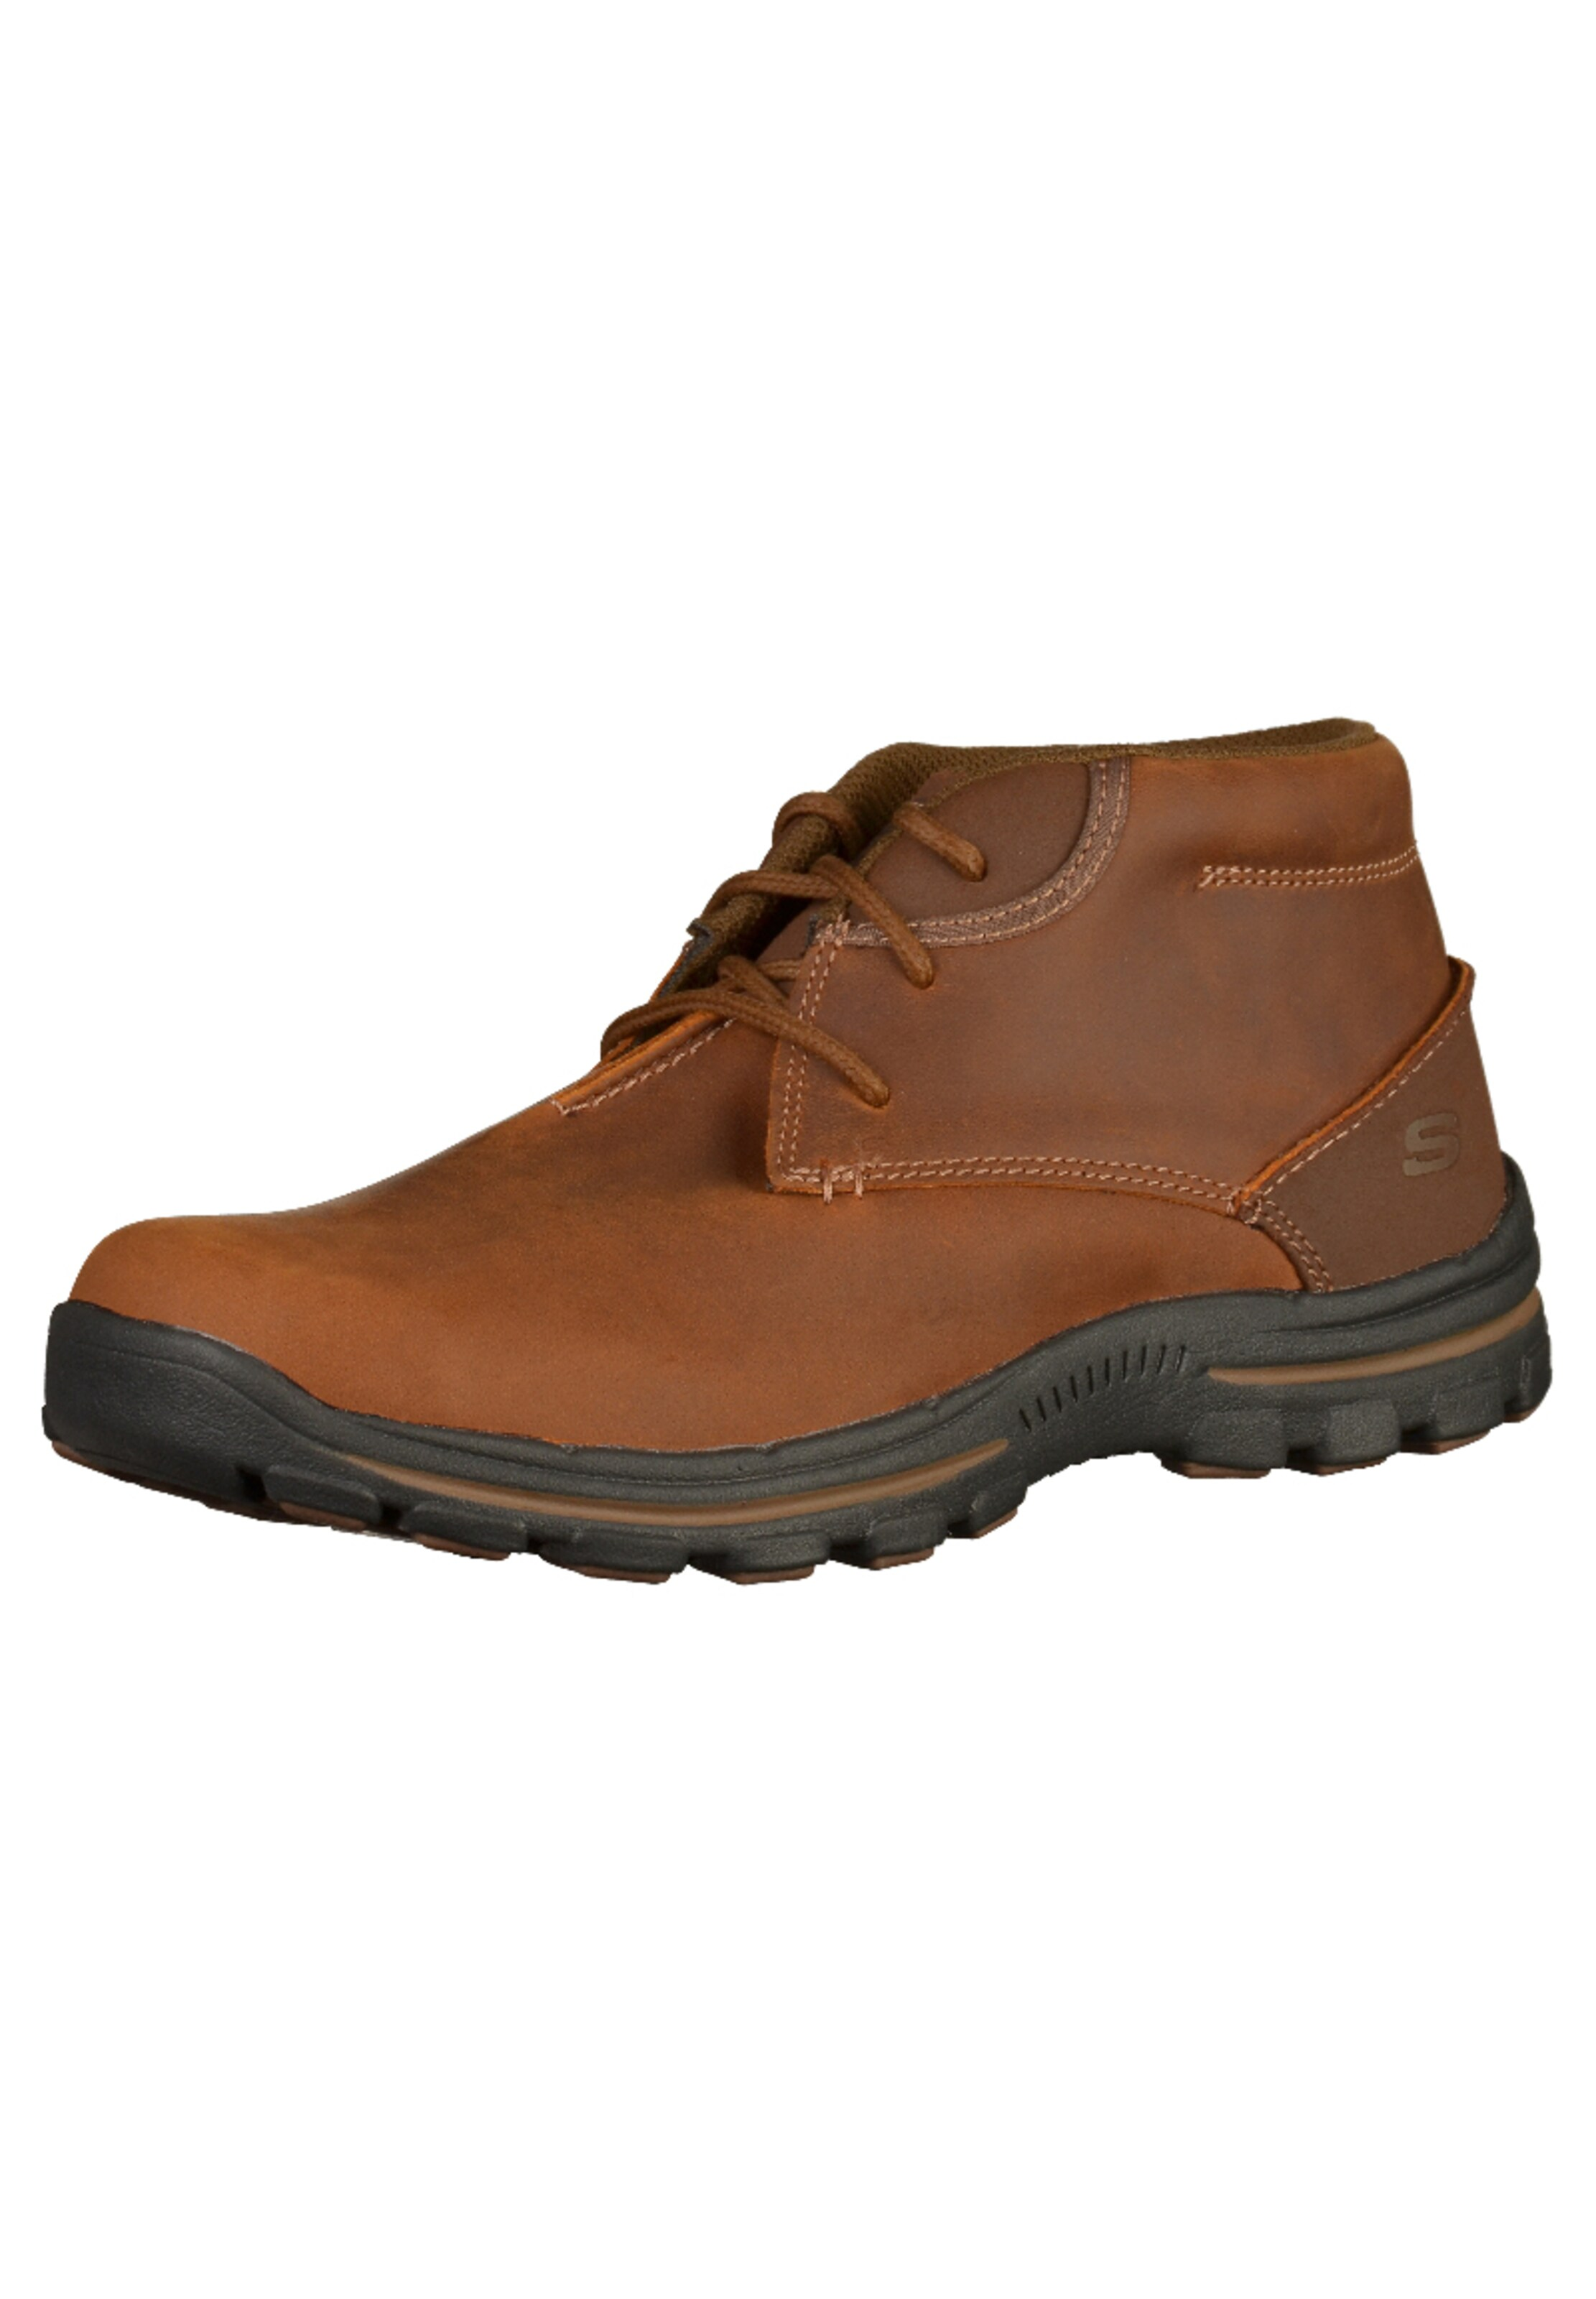 Haltbare Mode billige Schuhe SKECHERS | Halbschuhe Schuhe Gut getragene Schuhe